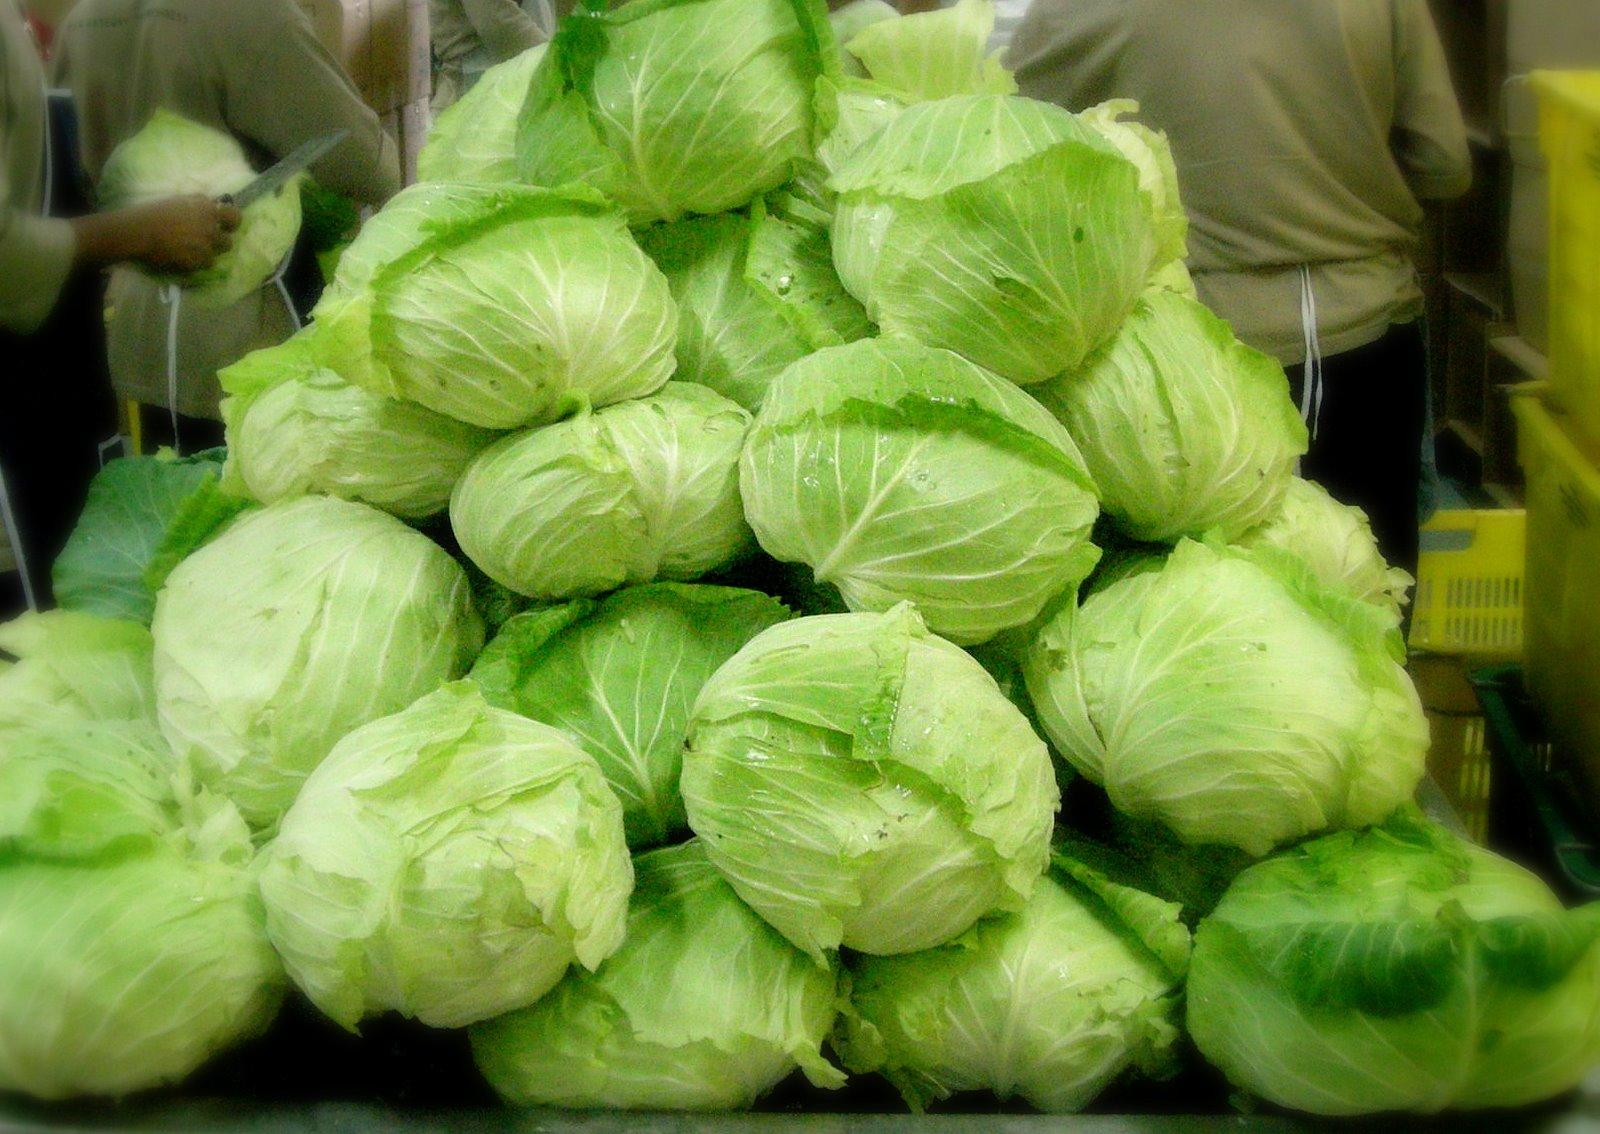 Buah-buahan dan Sayuran untuk Penderita Maag